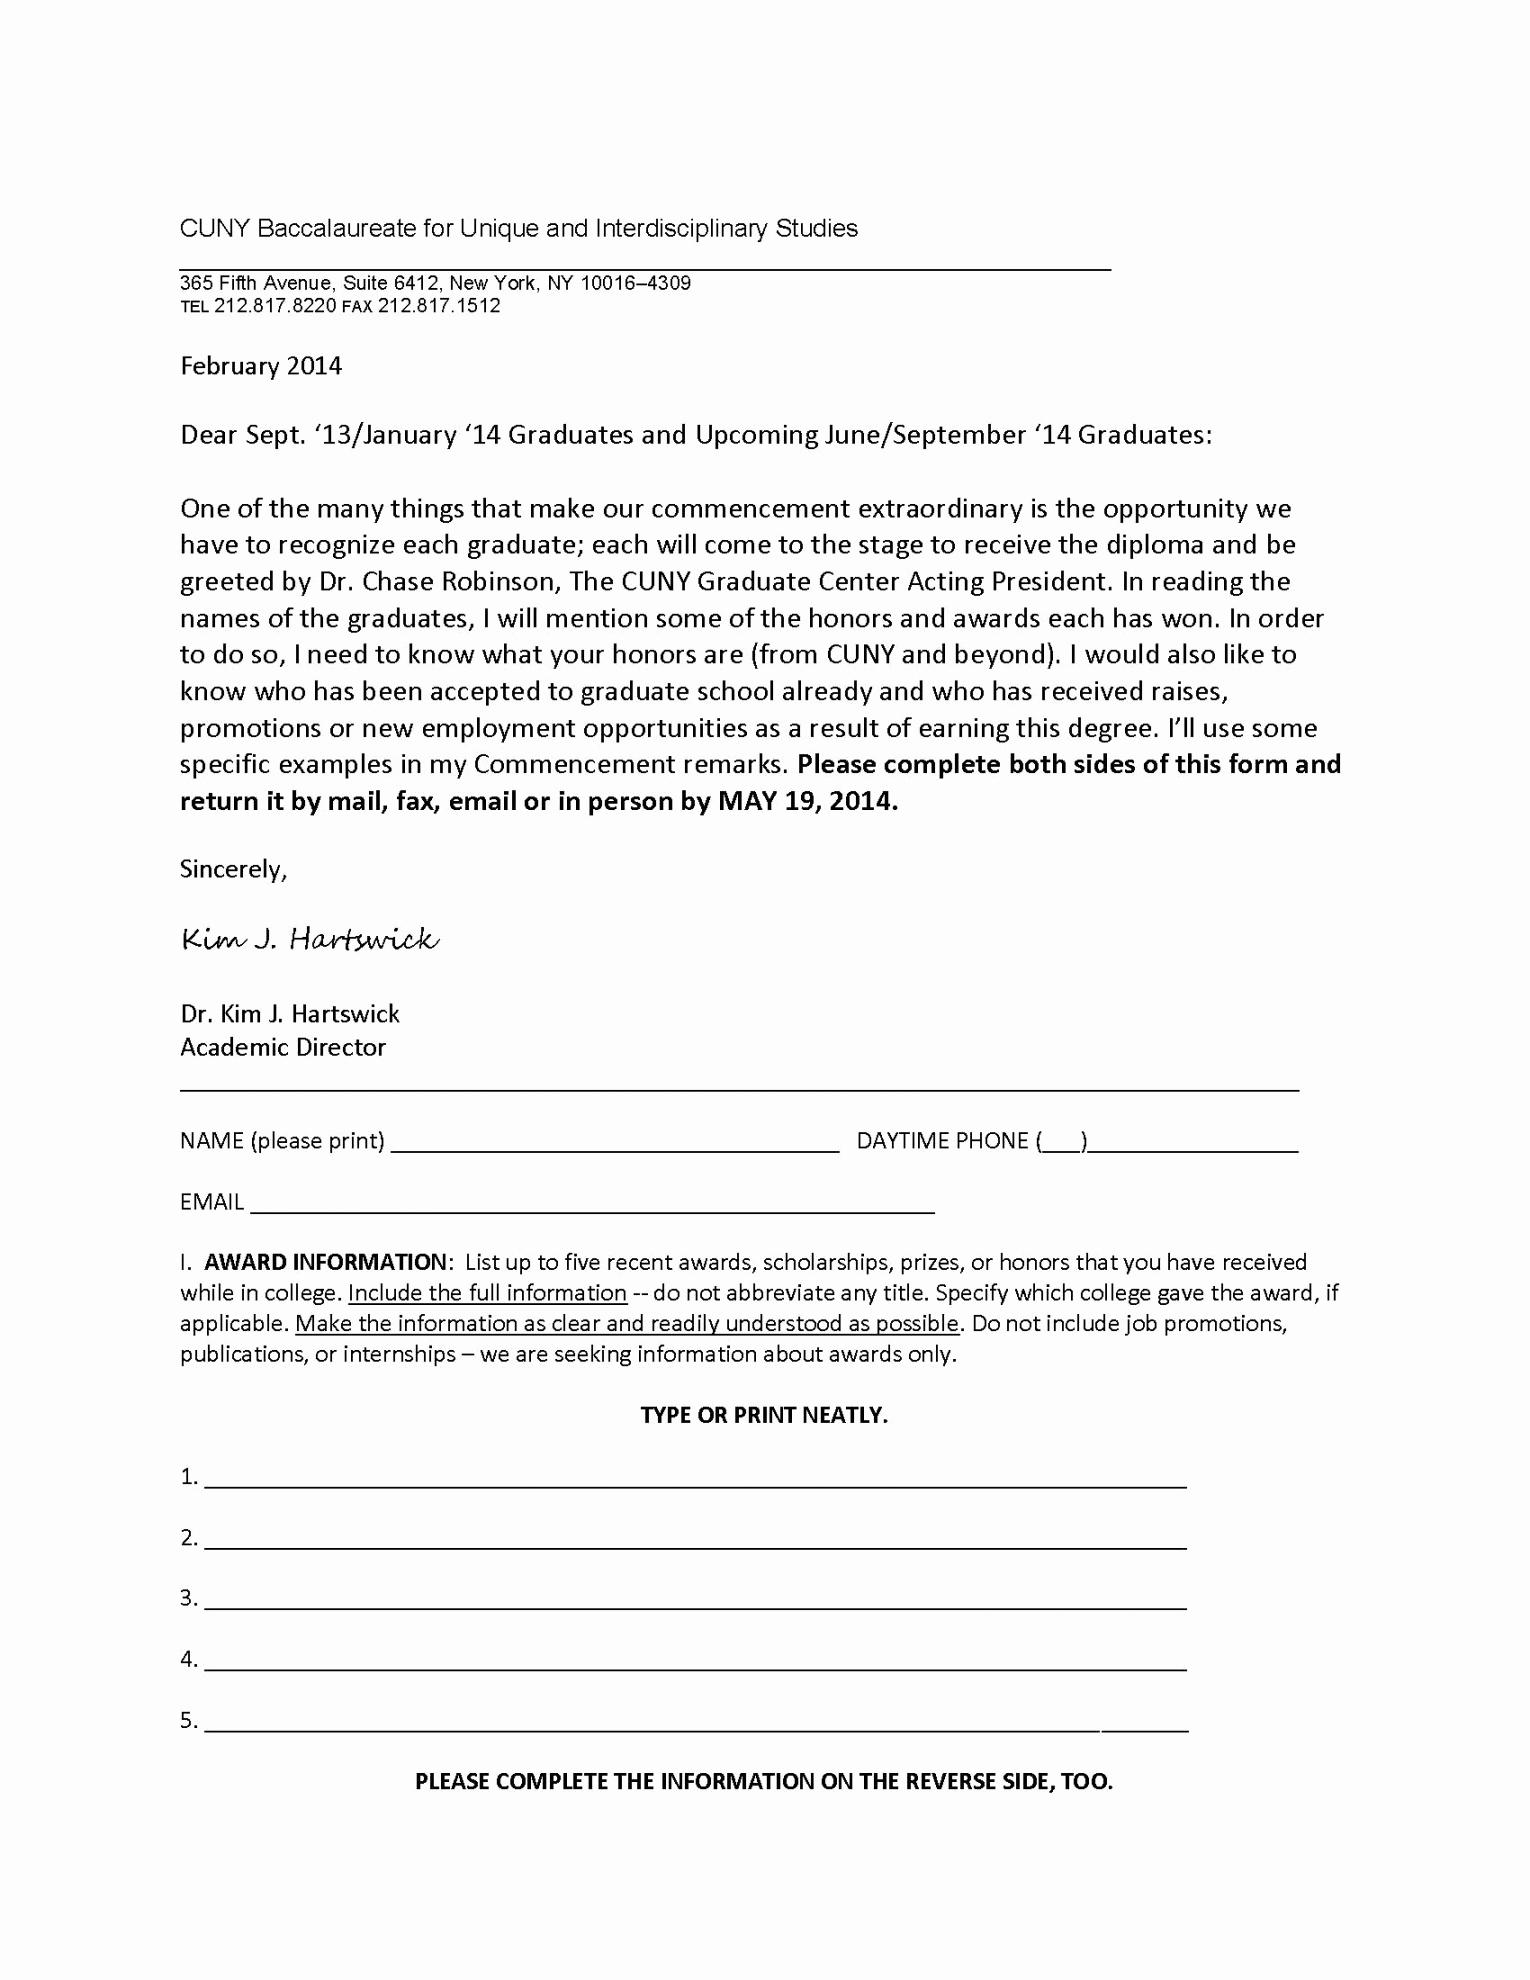 Graduation Ceremony Invitation Letter New Graduation Letter Template Dl Award Ceremony